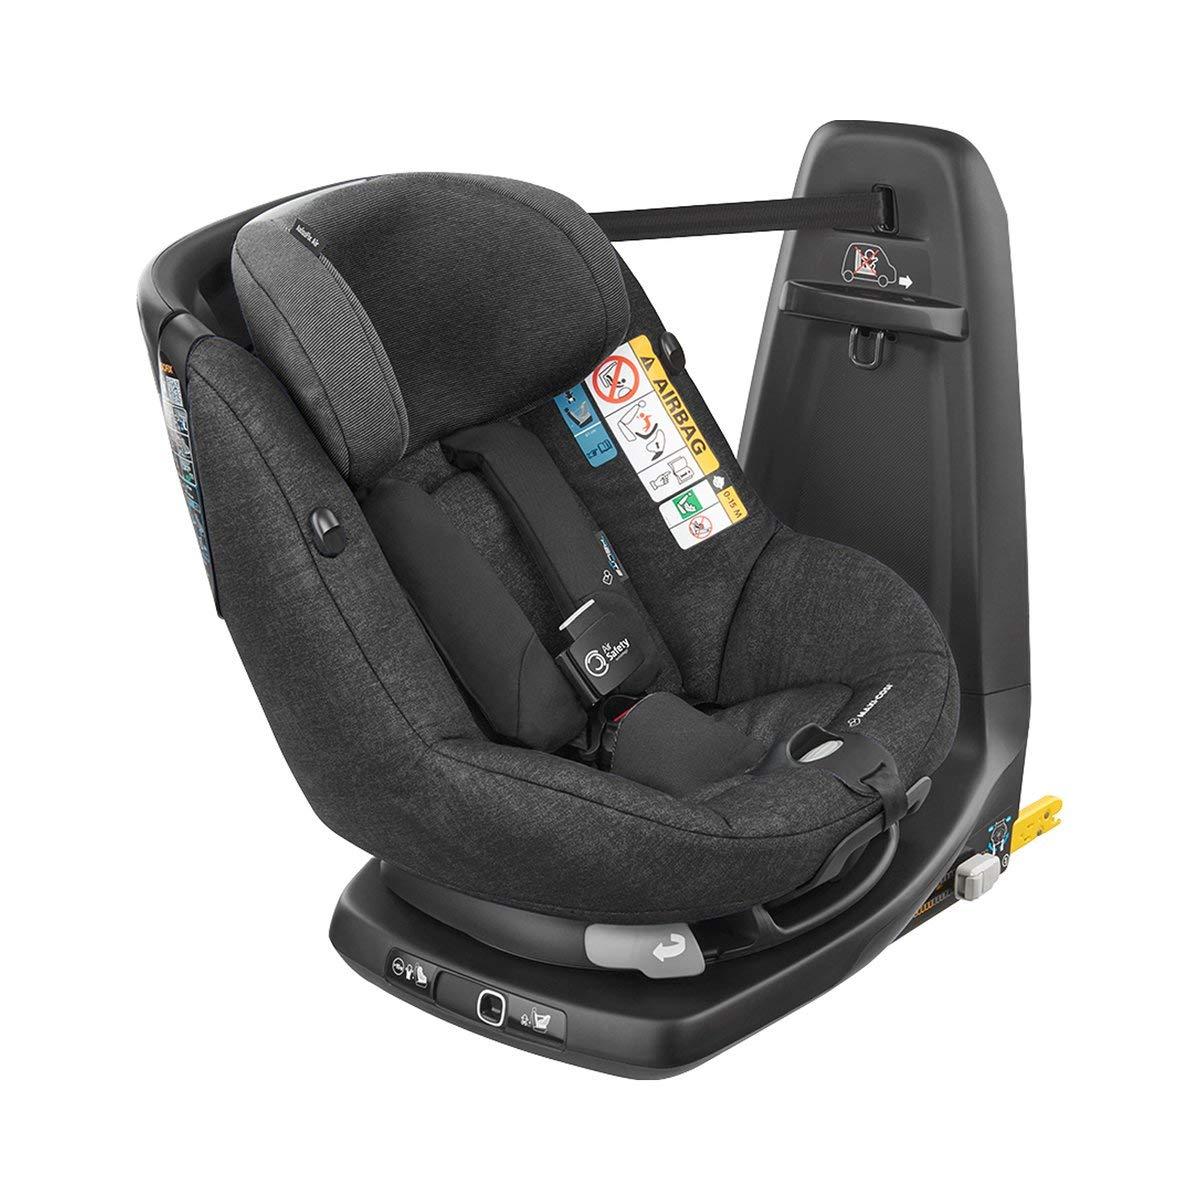 Maxi Cosi Axissfix Air mit Airbags Babyschale